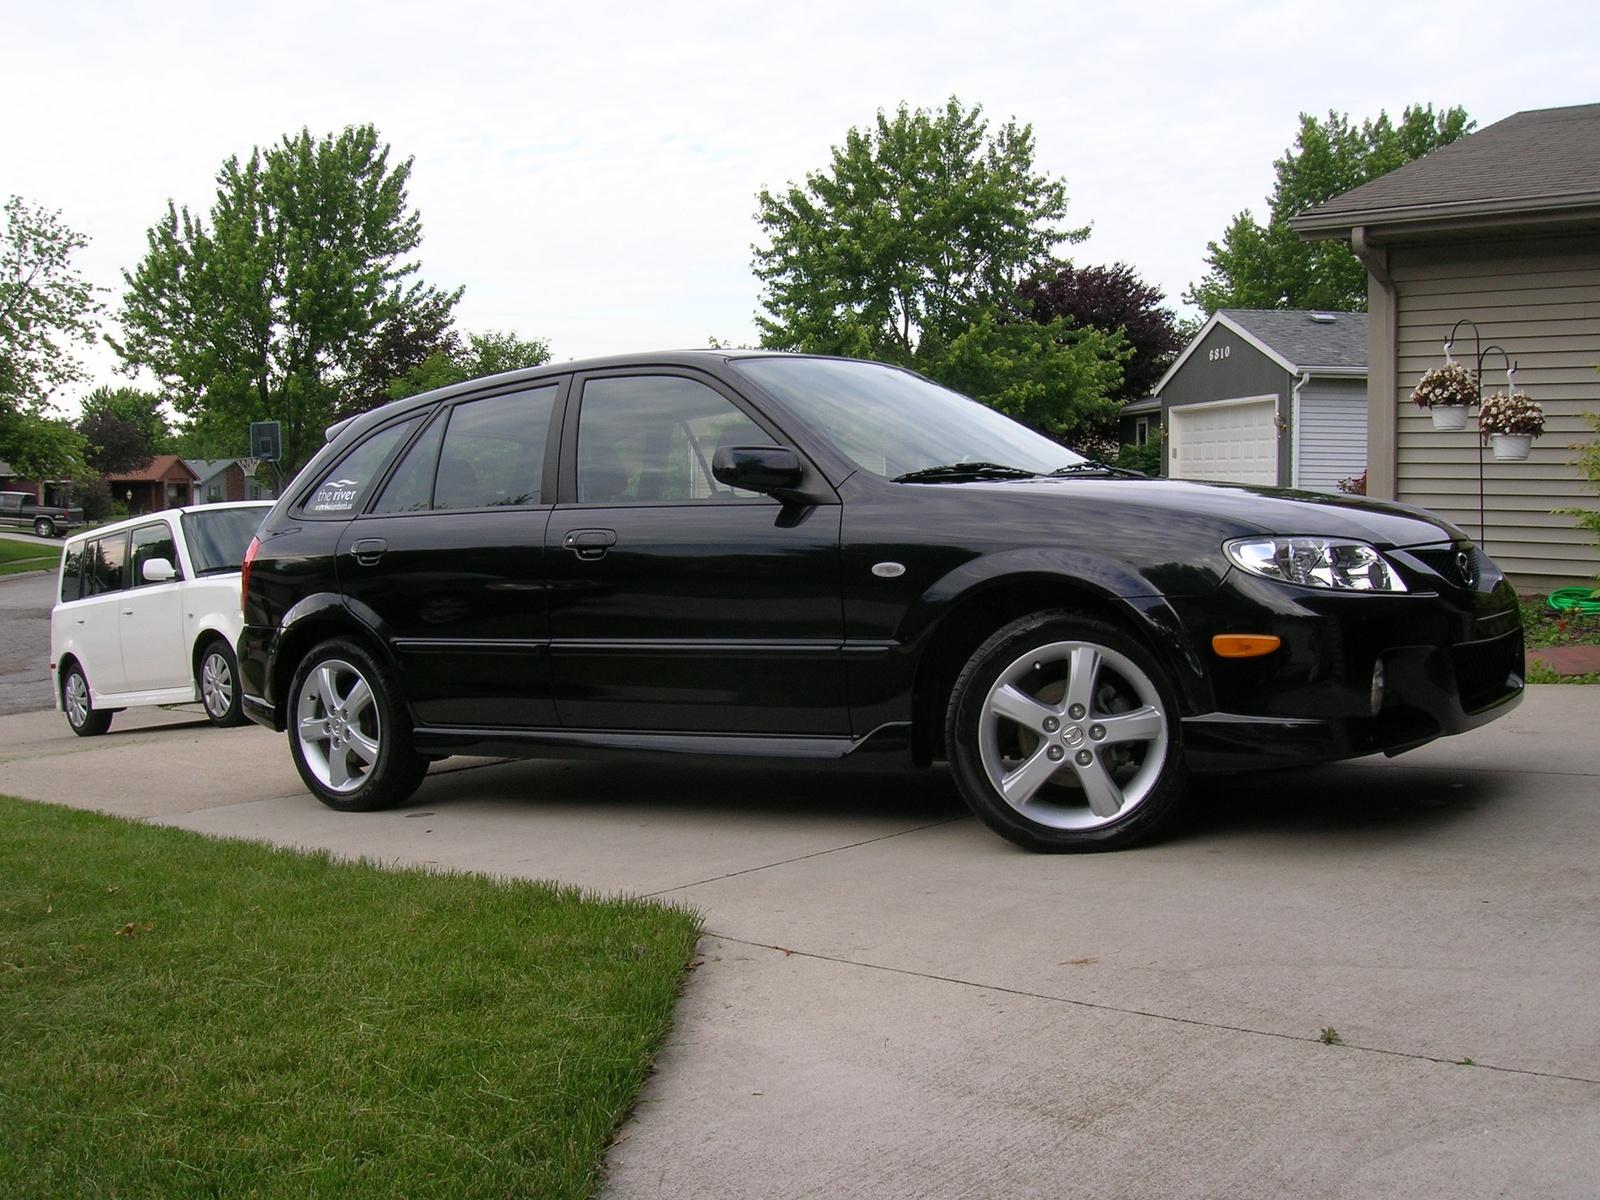 Mazda Protege5 2002 Tire Size2002 Vin Protege 5 Wagon Future Curbside Classics 2010 14 Cadillac Cts Sport